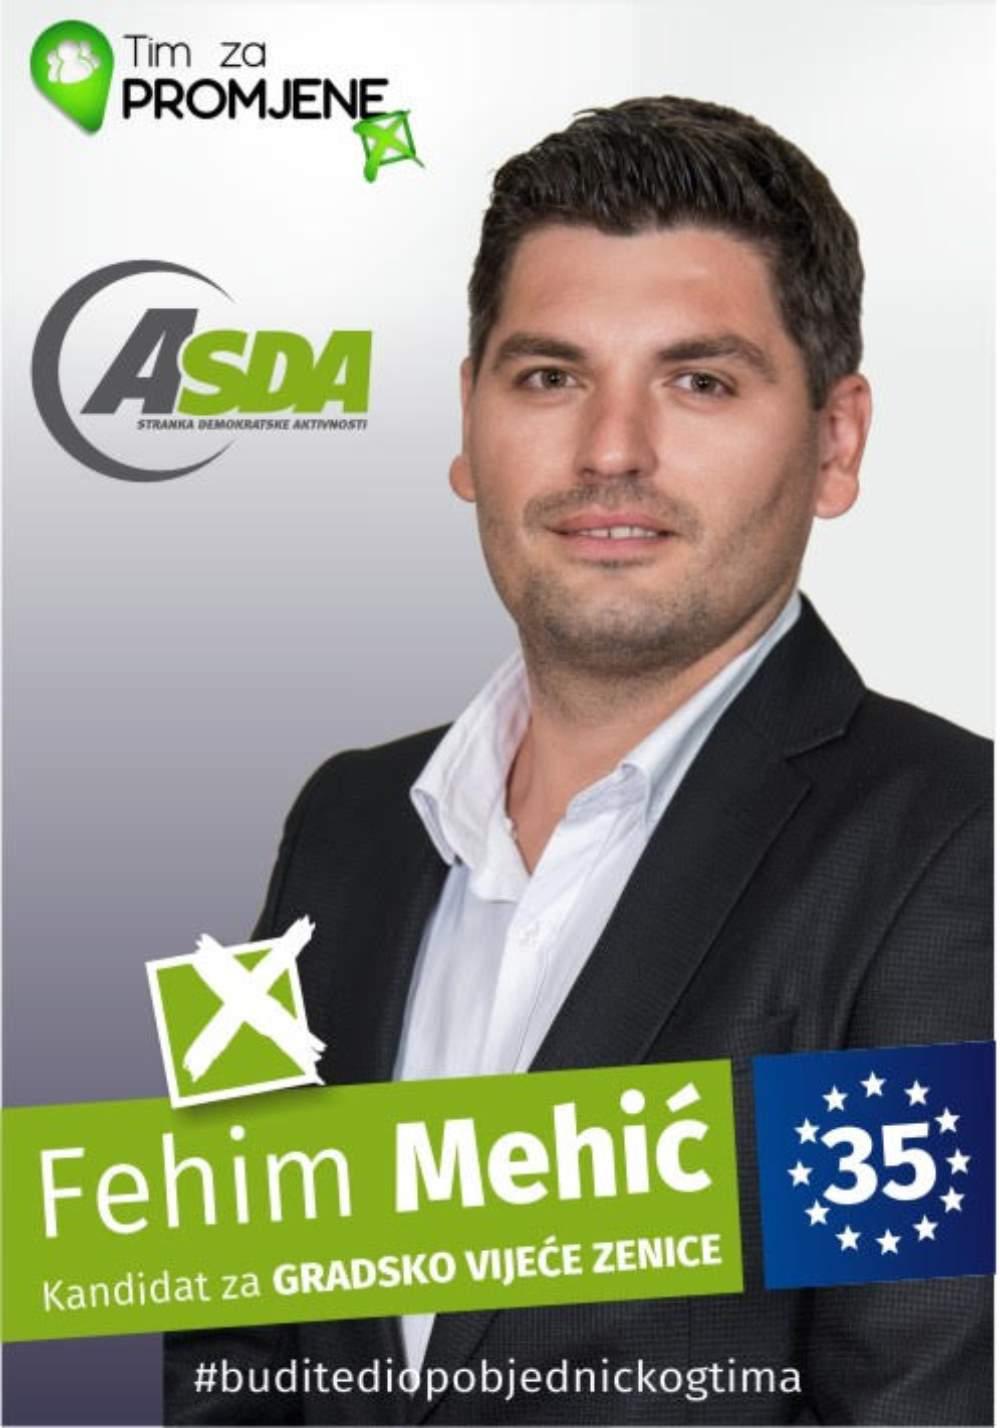 Fehim Mehić